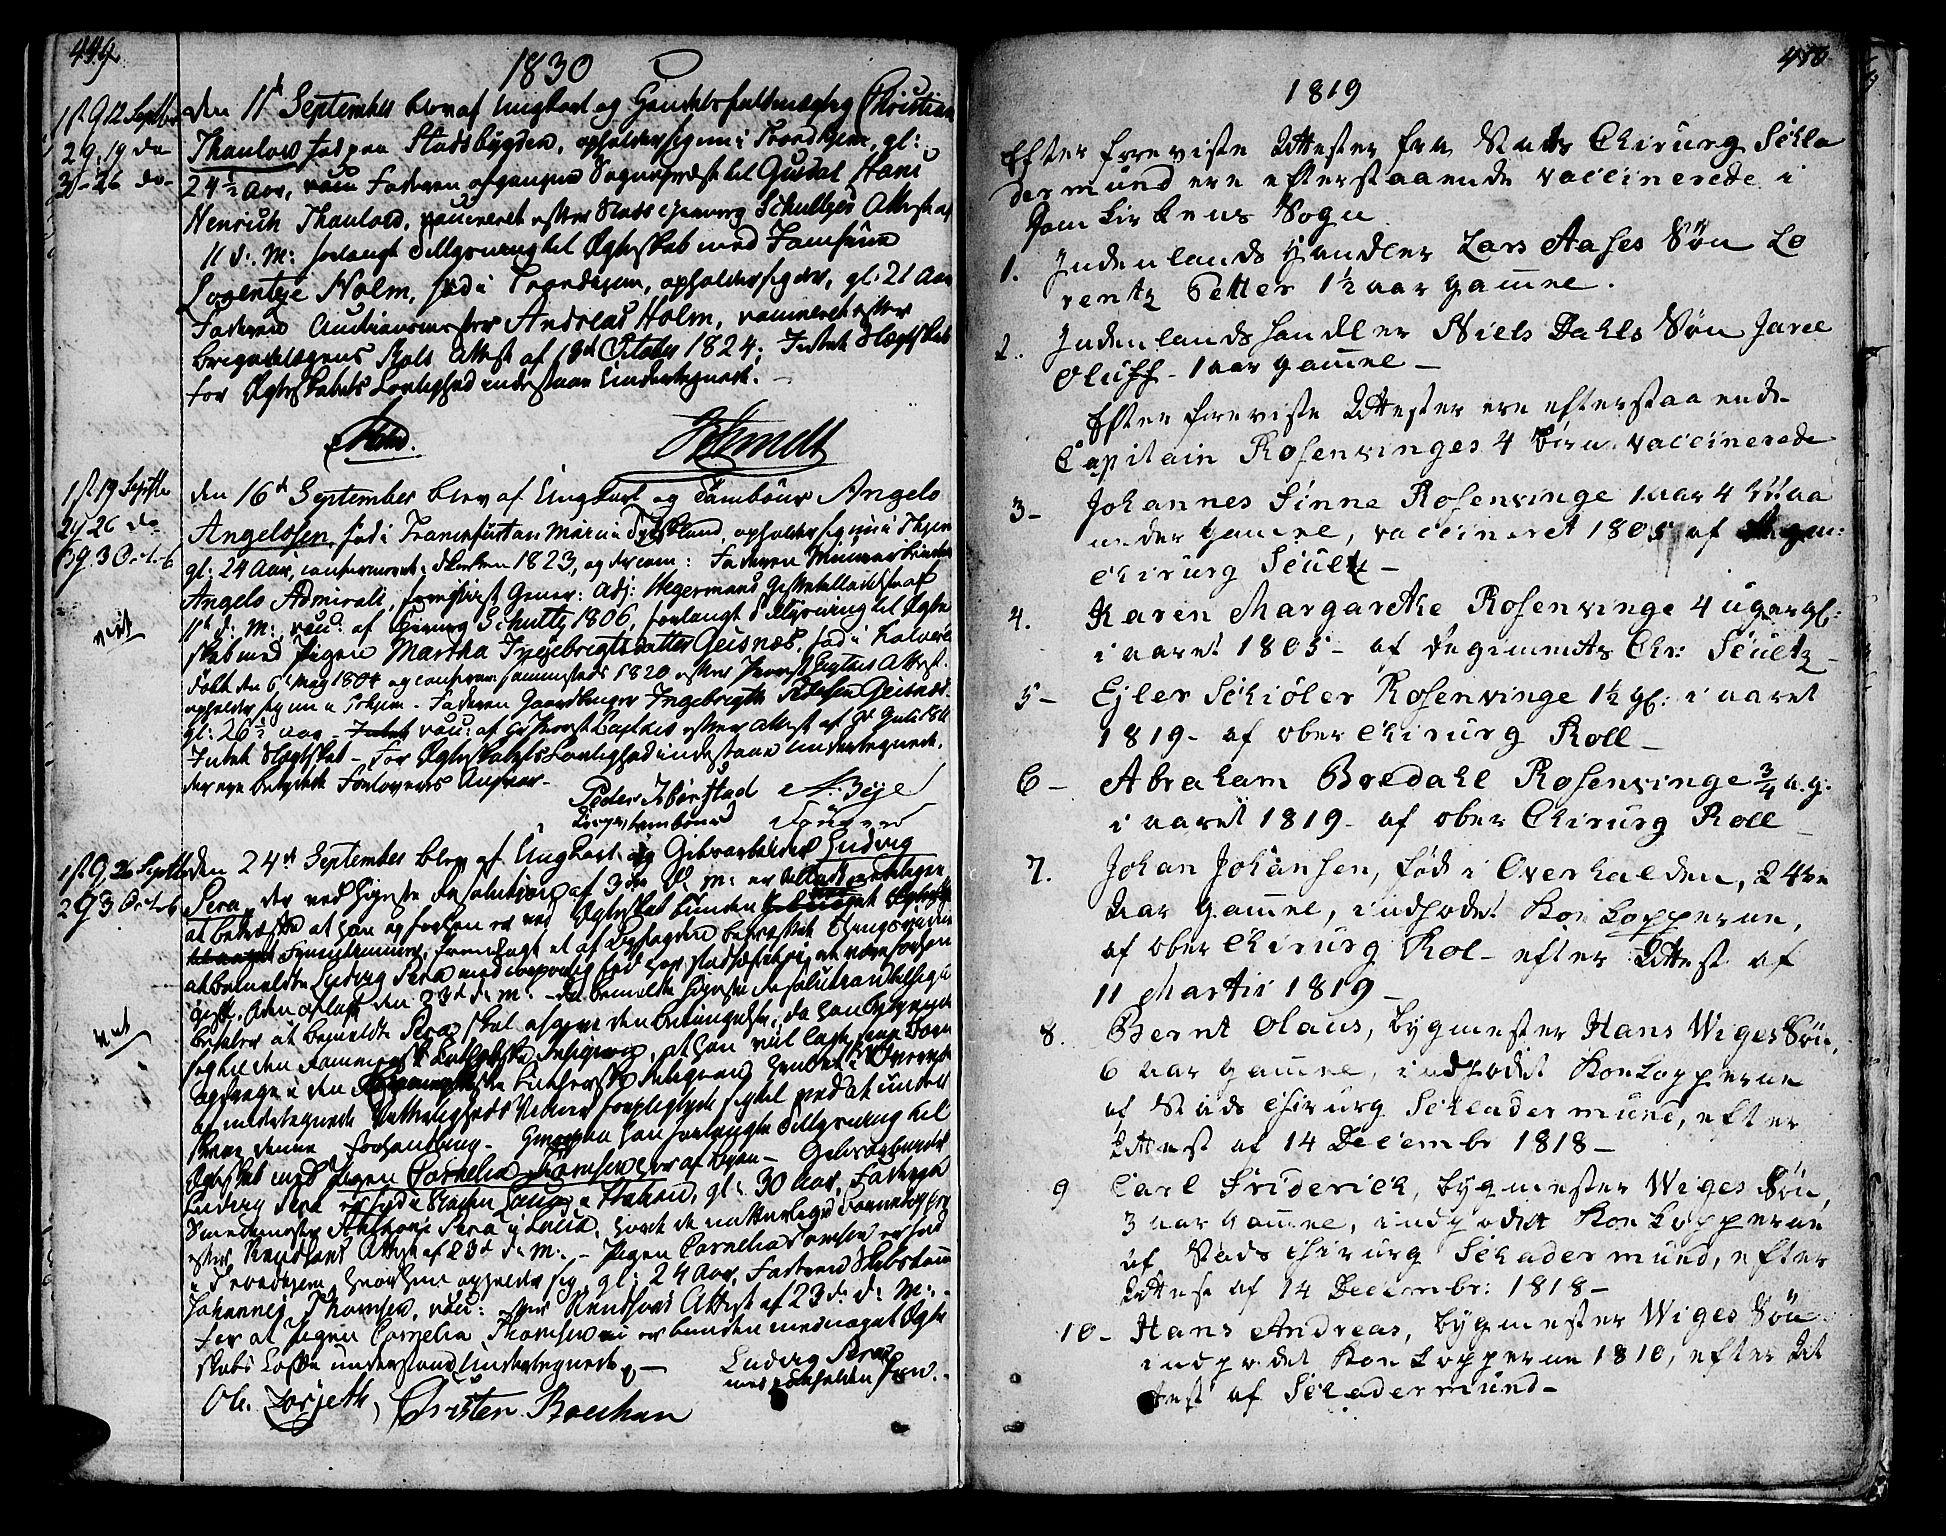 SAT, Ministerialprotokoller, klokkerbøker og fødselsregistre - Sør-Trøndelag, 601/L0042: Parish register (official) no. 601A10, 1802-1830, p. 449-450